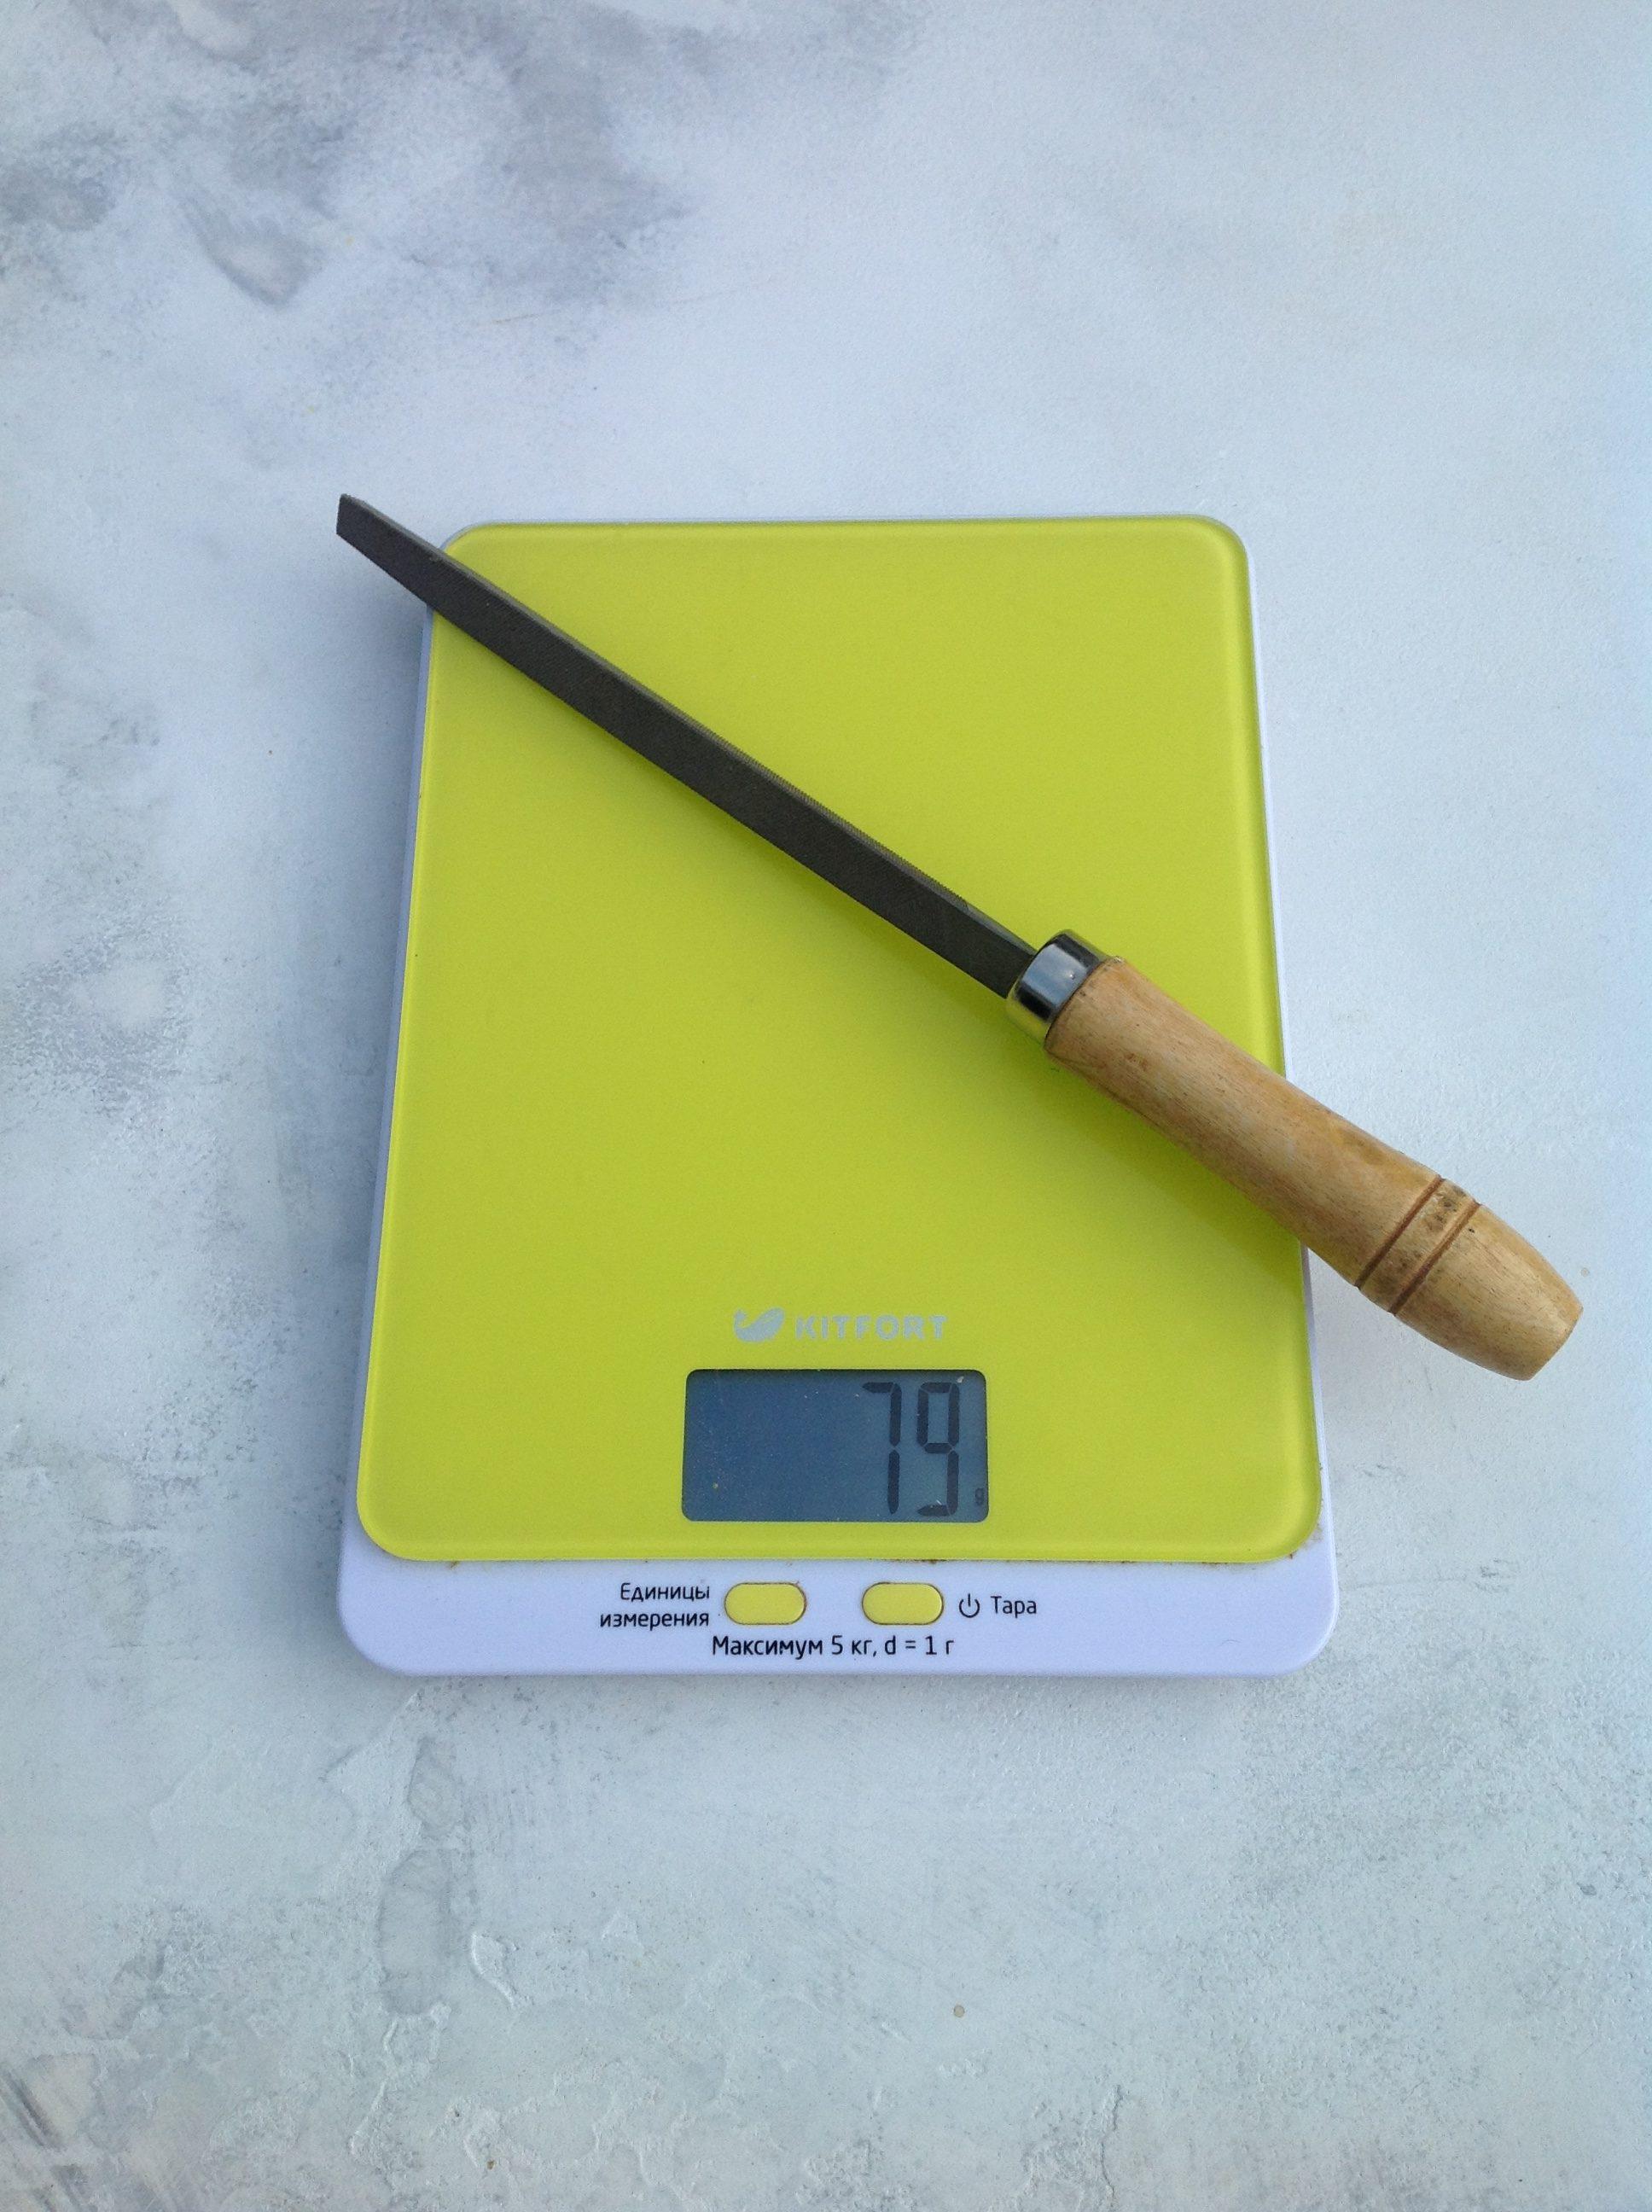 вес напильника трехгранного